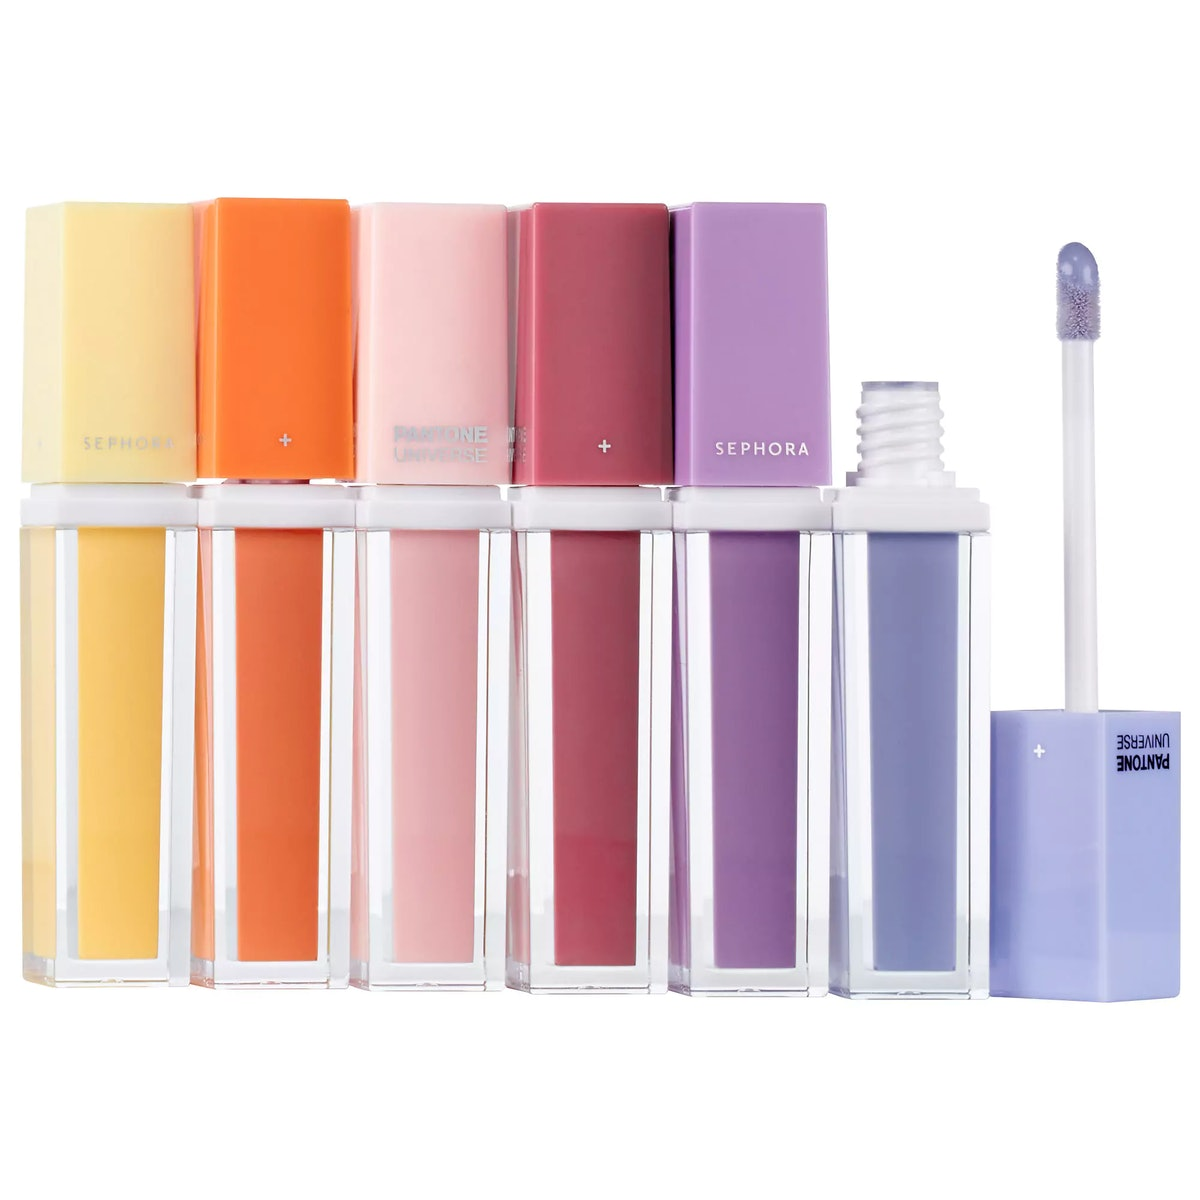 SEPHORA+PANTONE UNIVERSE Modern Watercolors Lip Gloss Set